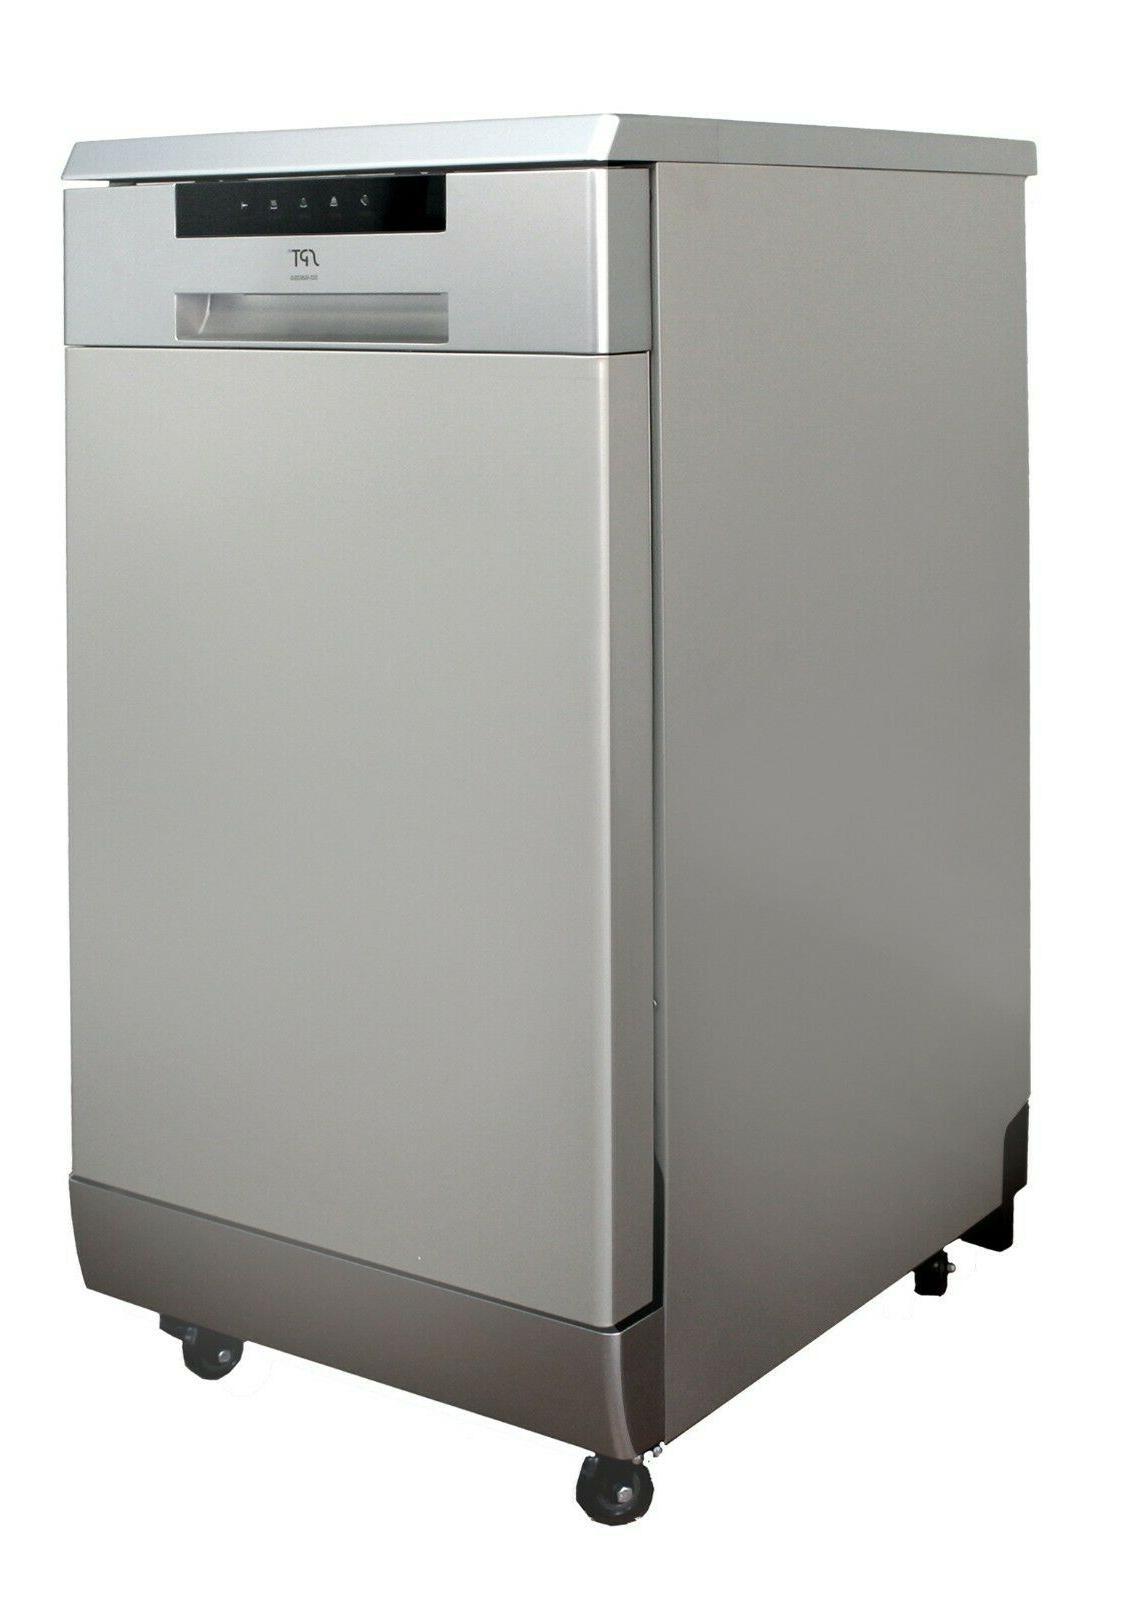 Sunpentown Dishwasher-ENERGY STAR Steel - SD-9263SS